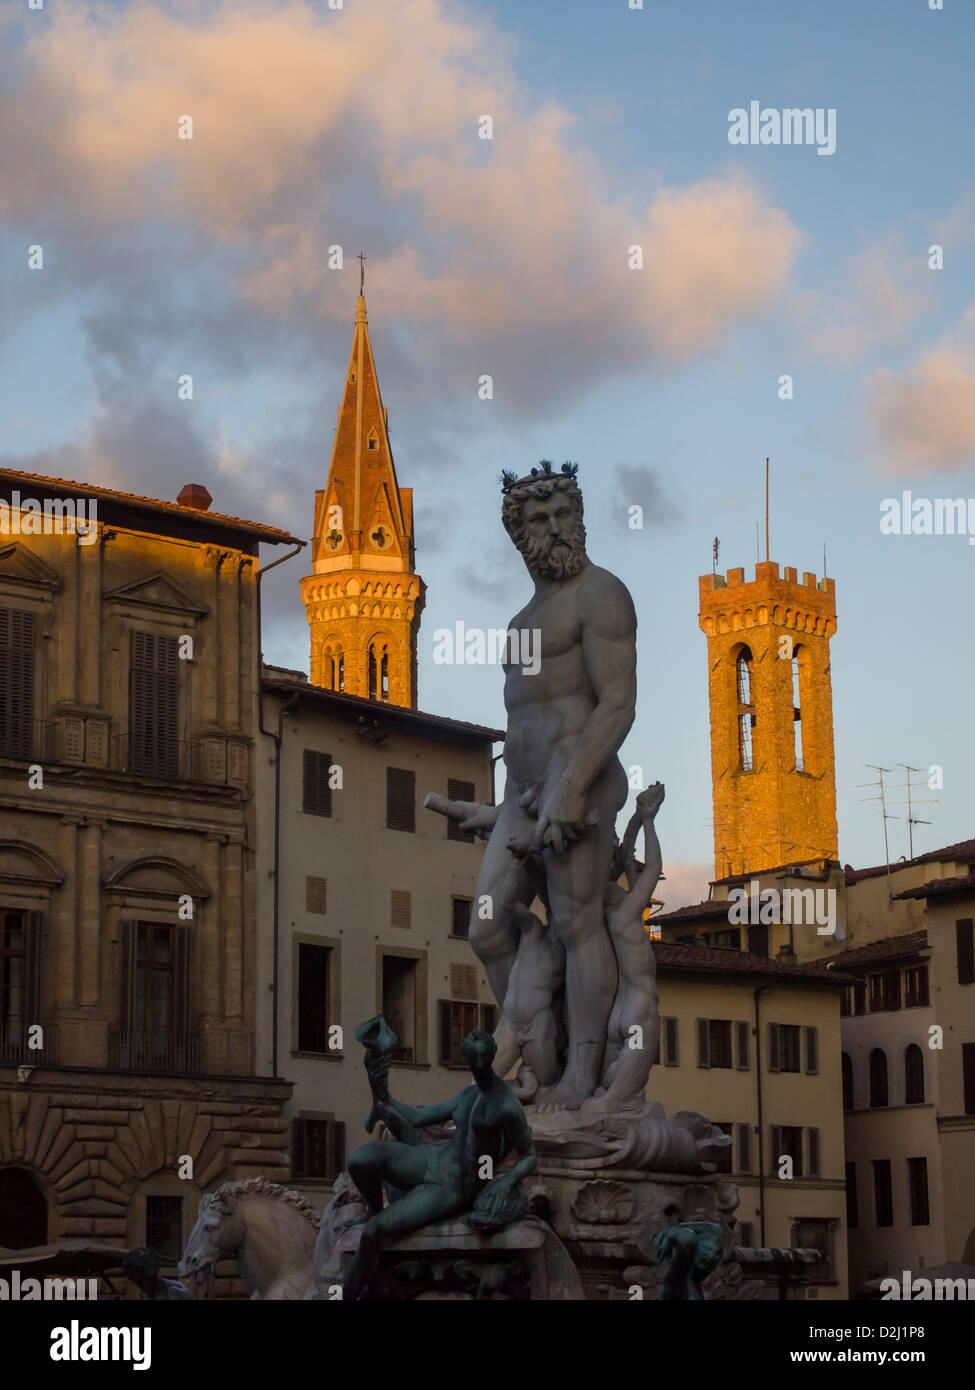 Italy,Tuscany,Florence, Neptune fountain and Badia Fiorentina bell tower,Signoria square. Stock Photo